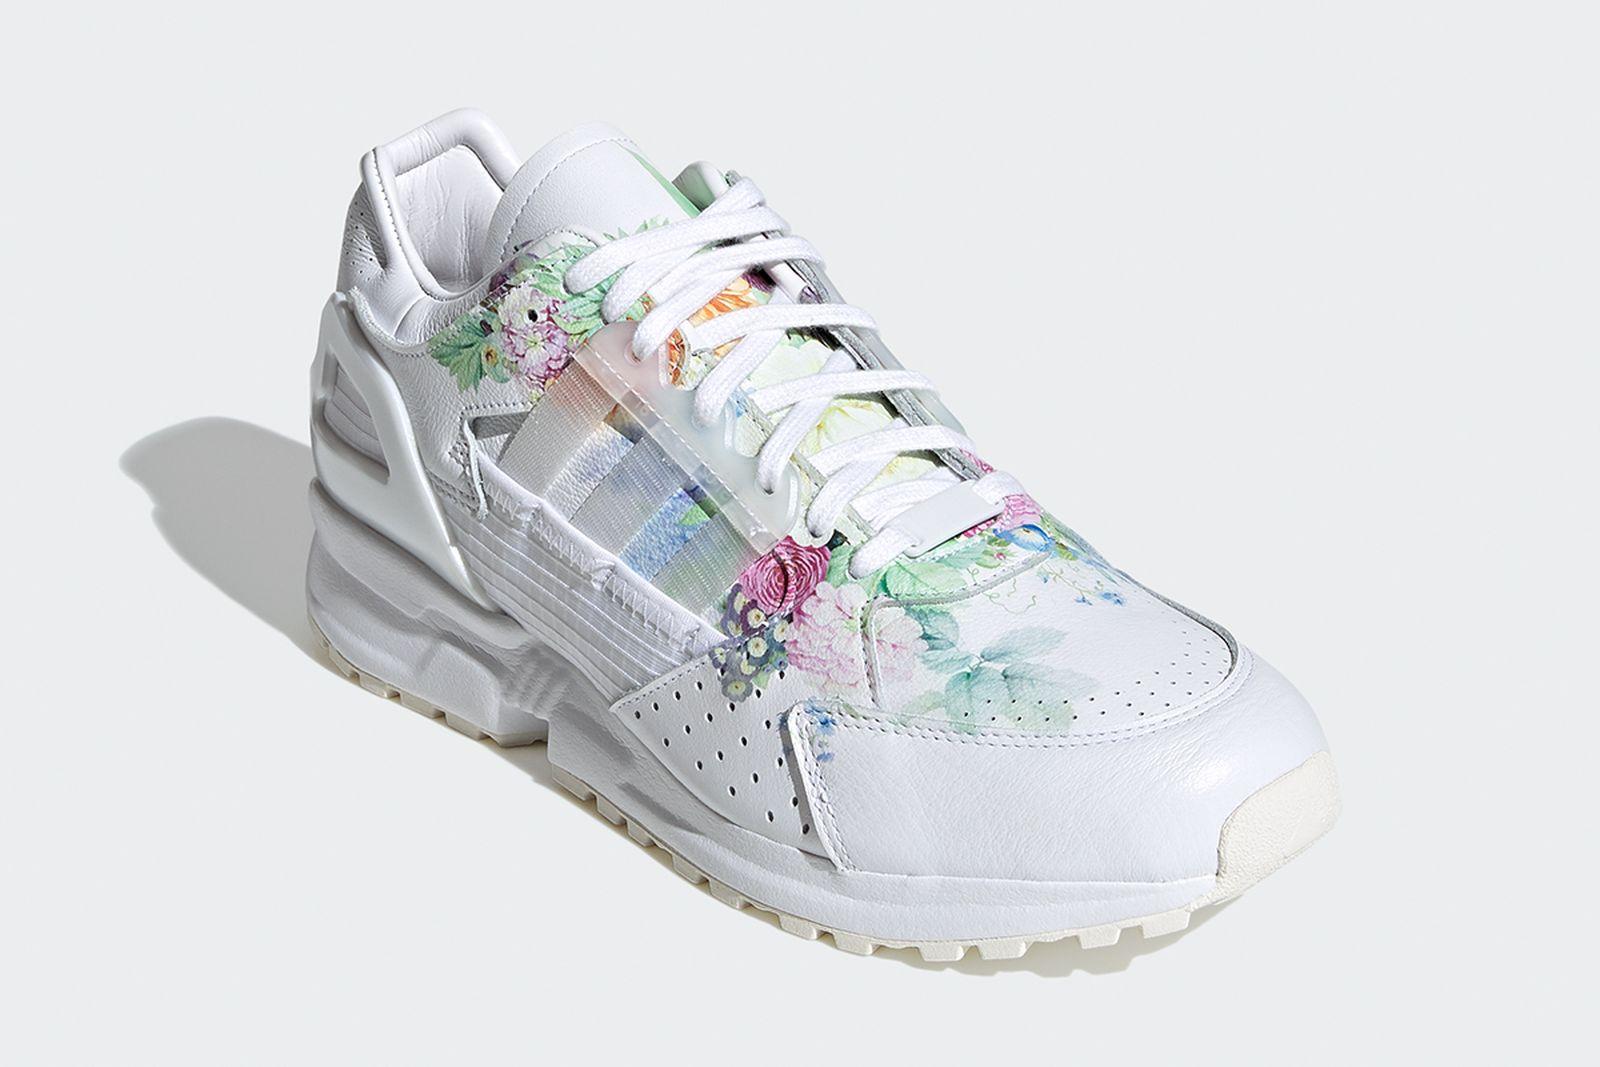 meissen-adidas-originals-zx-10000-c-release-date-price-03